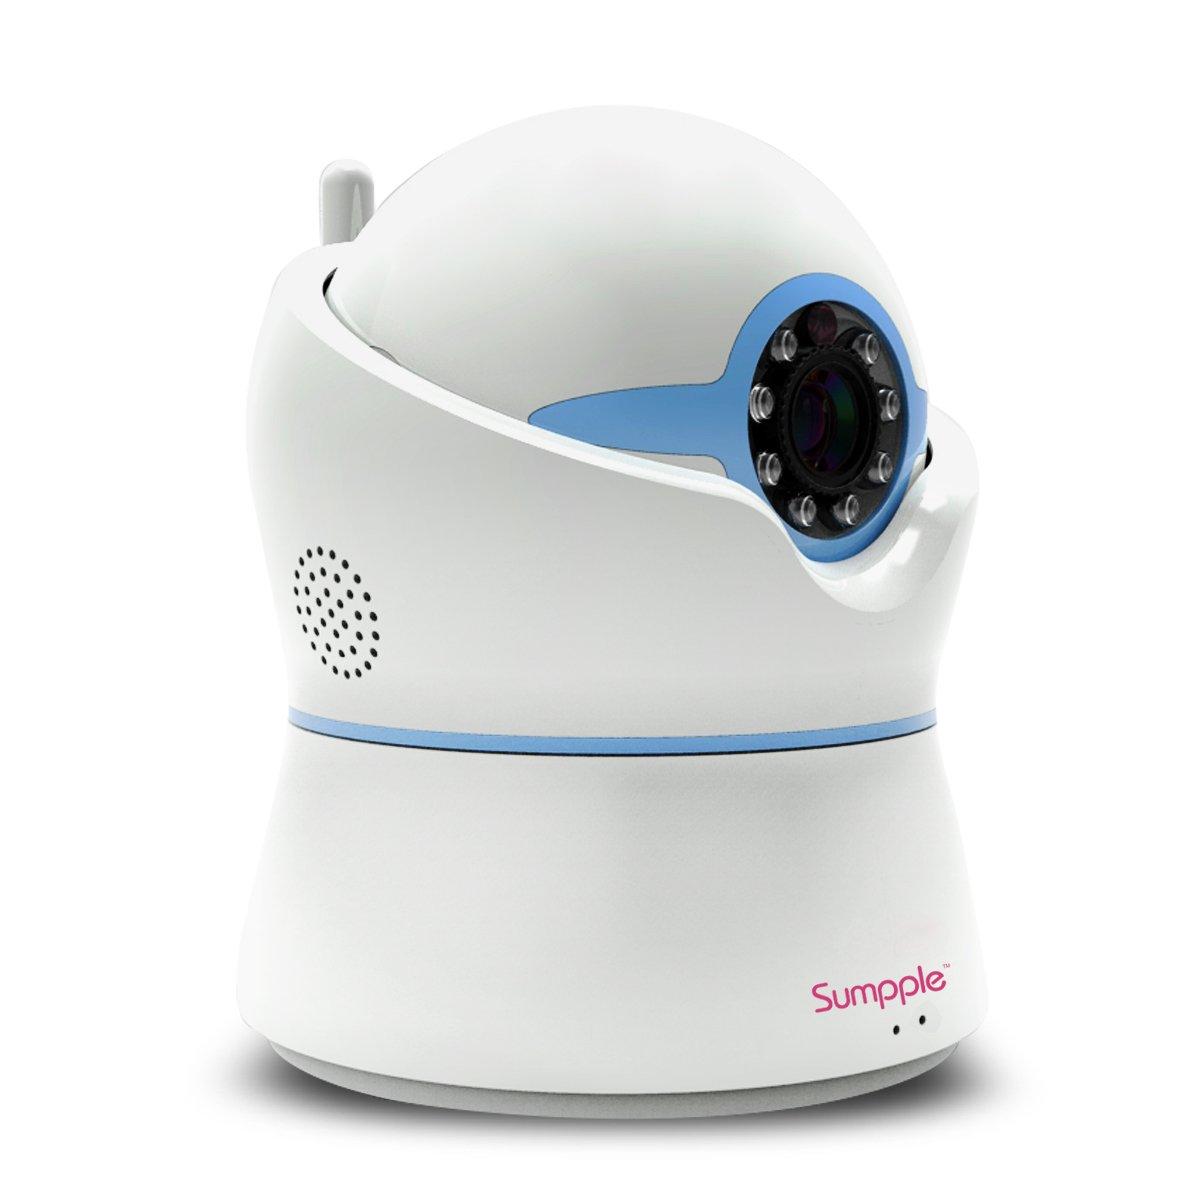 Sumpple 有線/ワイヤレス無線WiFi 1280x720P 100万画素 ベビー ビデオ モニター カメラ 夜間暗視 双方向オーディオ パン/チルト 音楽プレーヤー 動体/音声/温度/湿度検知 iOS, AndroidまたはPCに対応 ブルー B013SN5668 ブルー ブルー